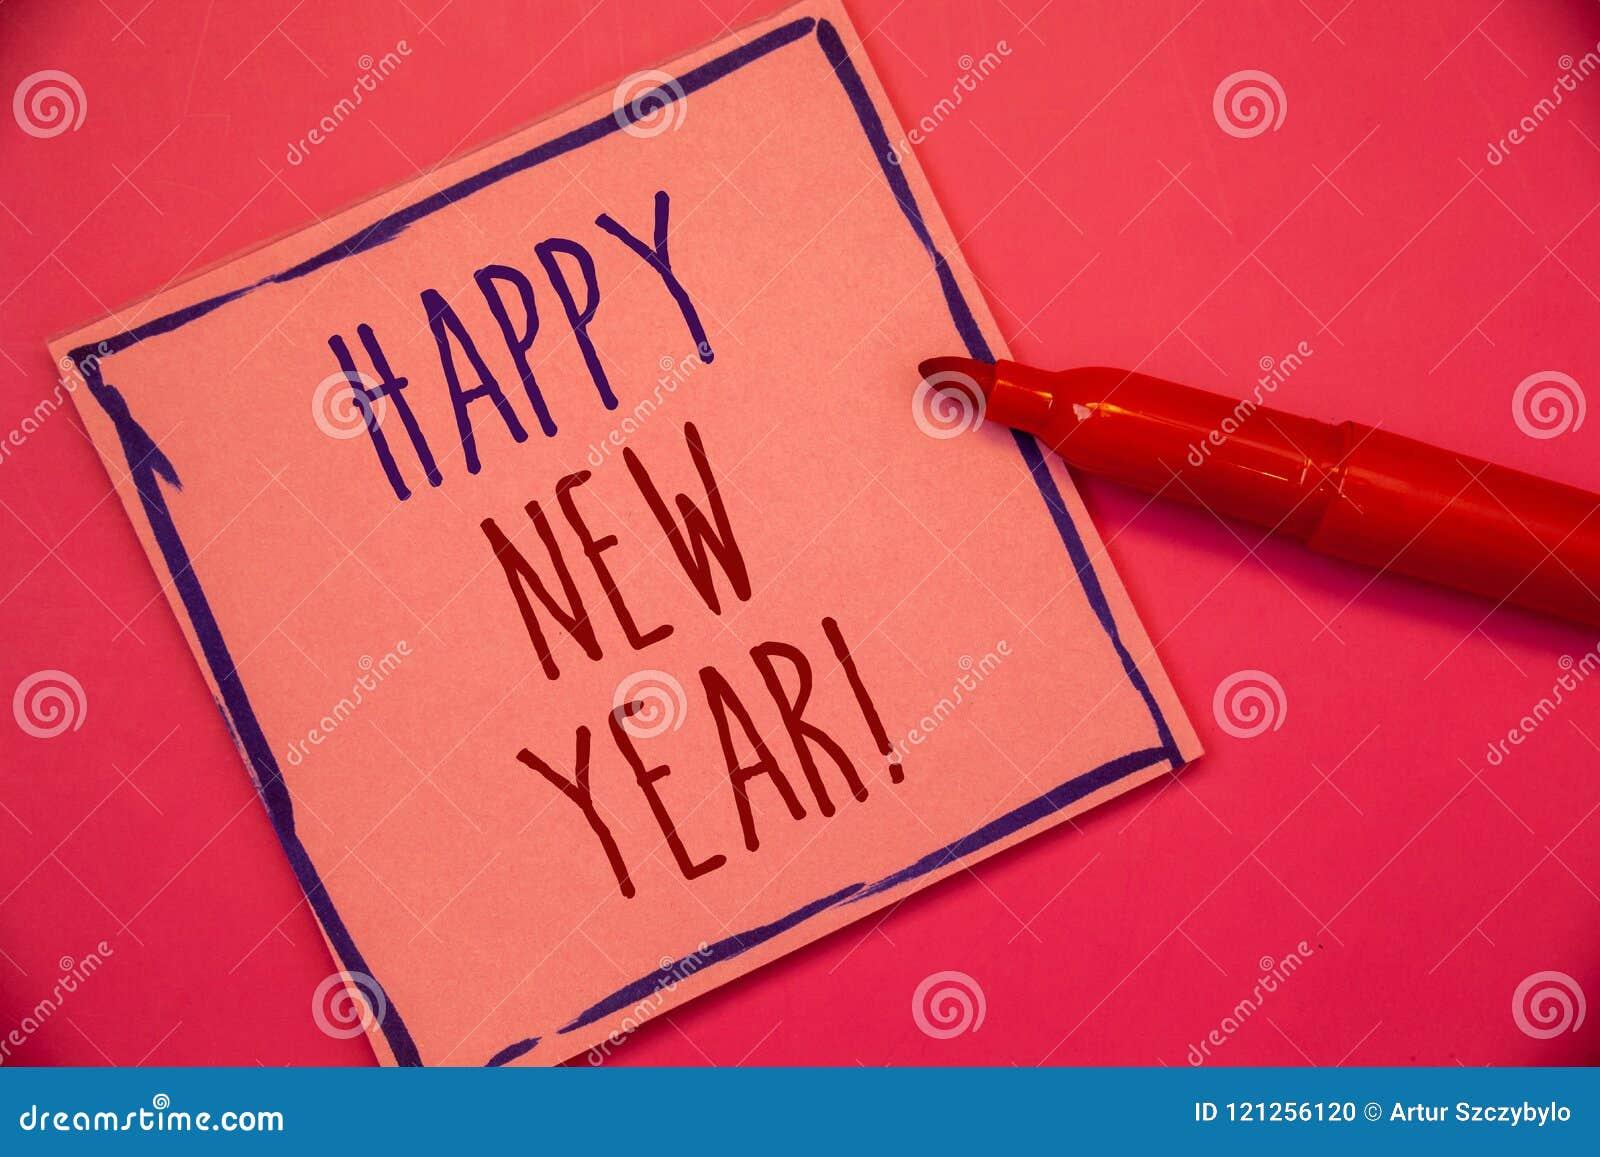 Writing note showing Happy New Year Motivational Call. Business photo showcasing Greeting Celebrating Holiday Fresh Start Ideas c